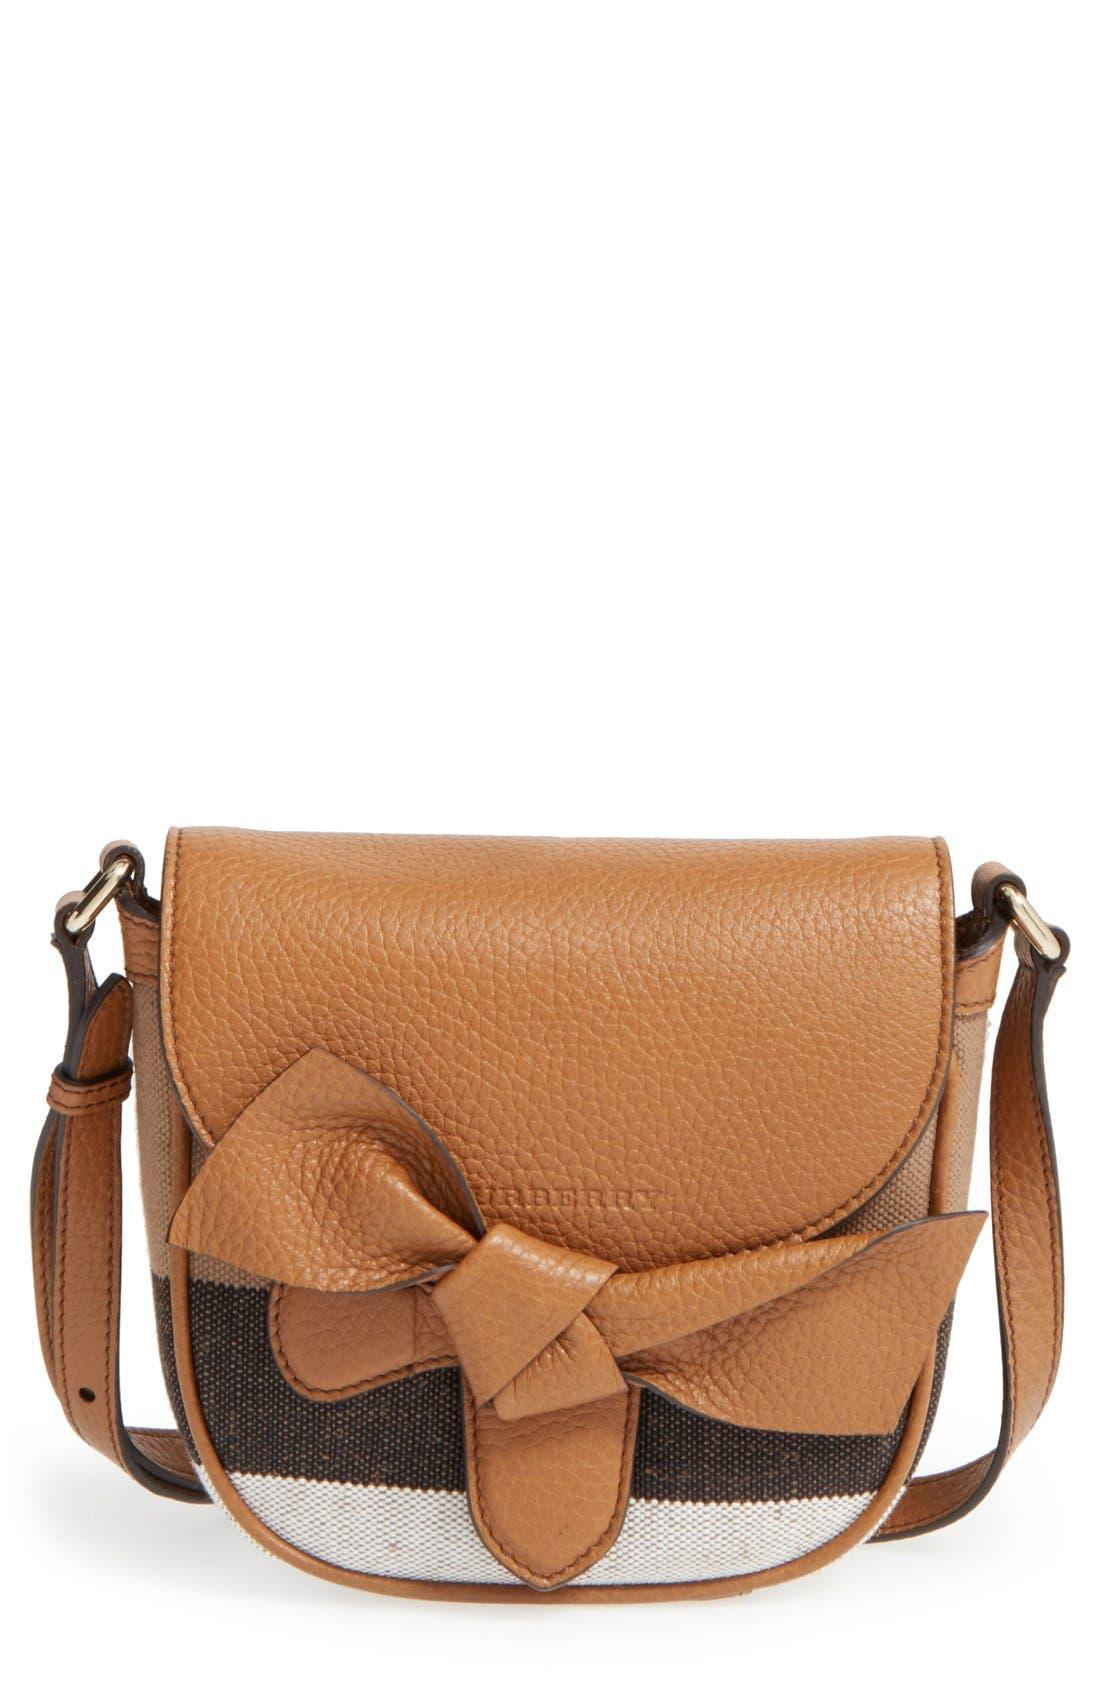 BURBERRY Canvas Check & Leather Crossbody Bag, Main, color, 251